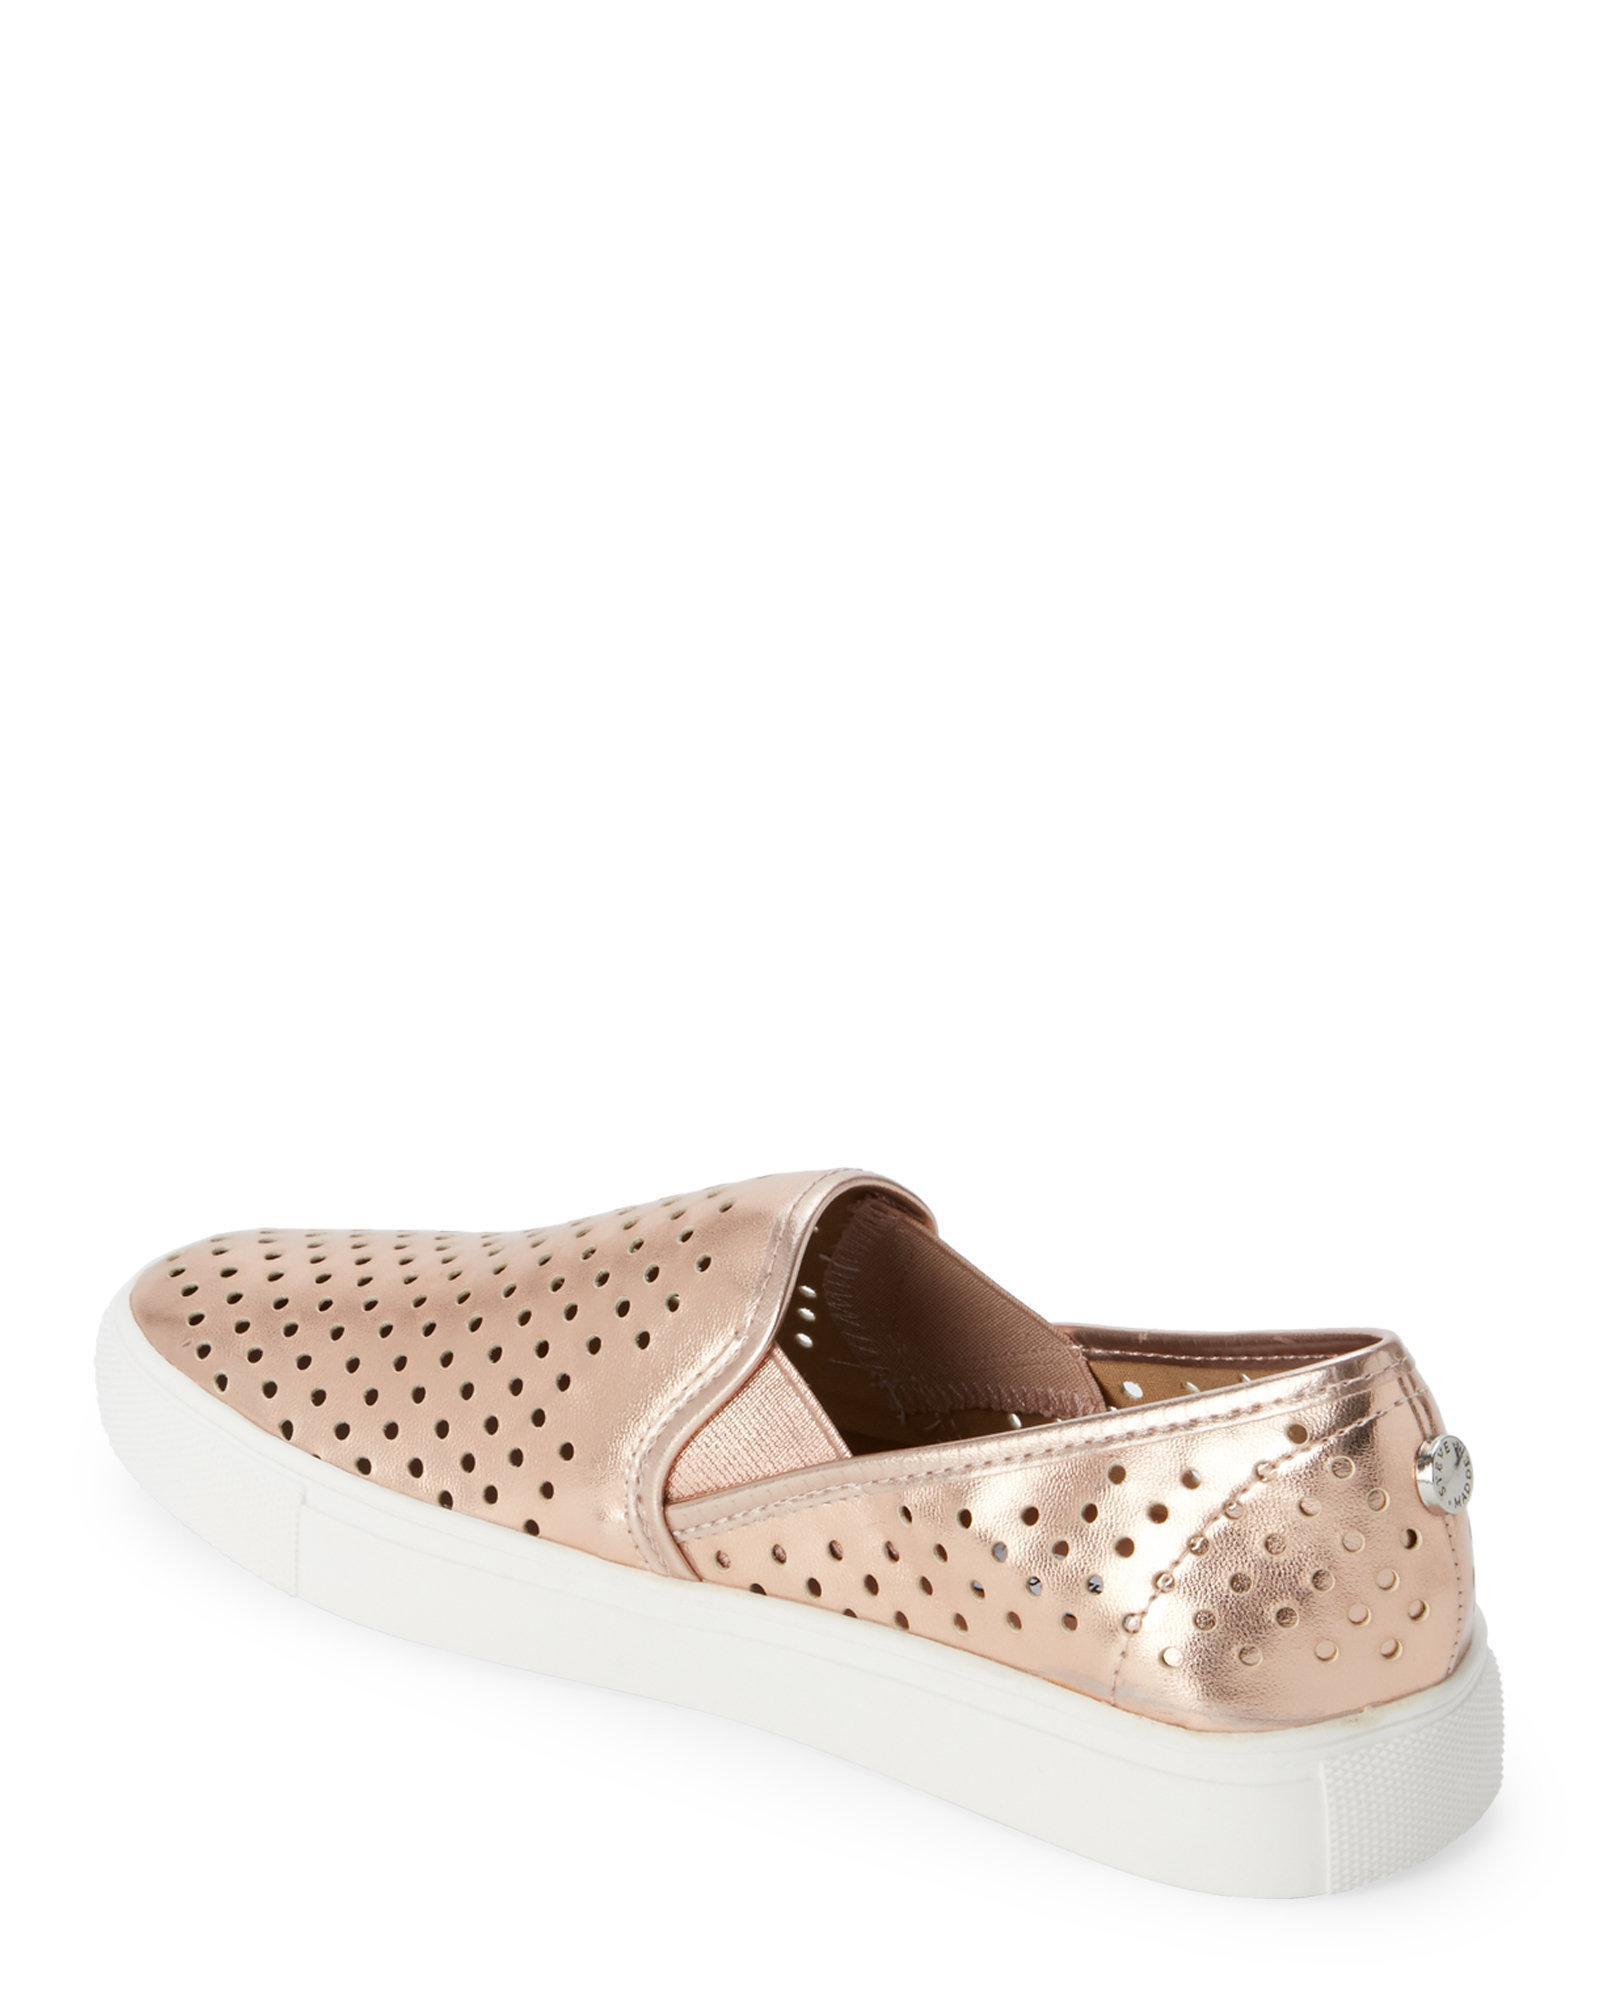 STEVEN by Steve Madden owen Womens Fashion Sneakers rose gold 6  US / 4 UK